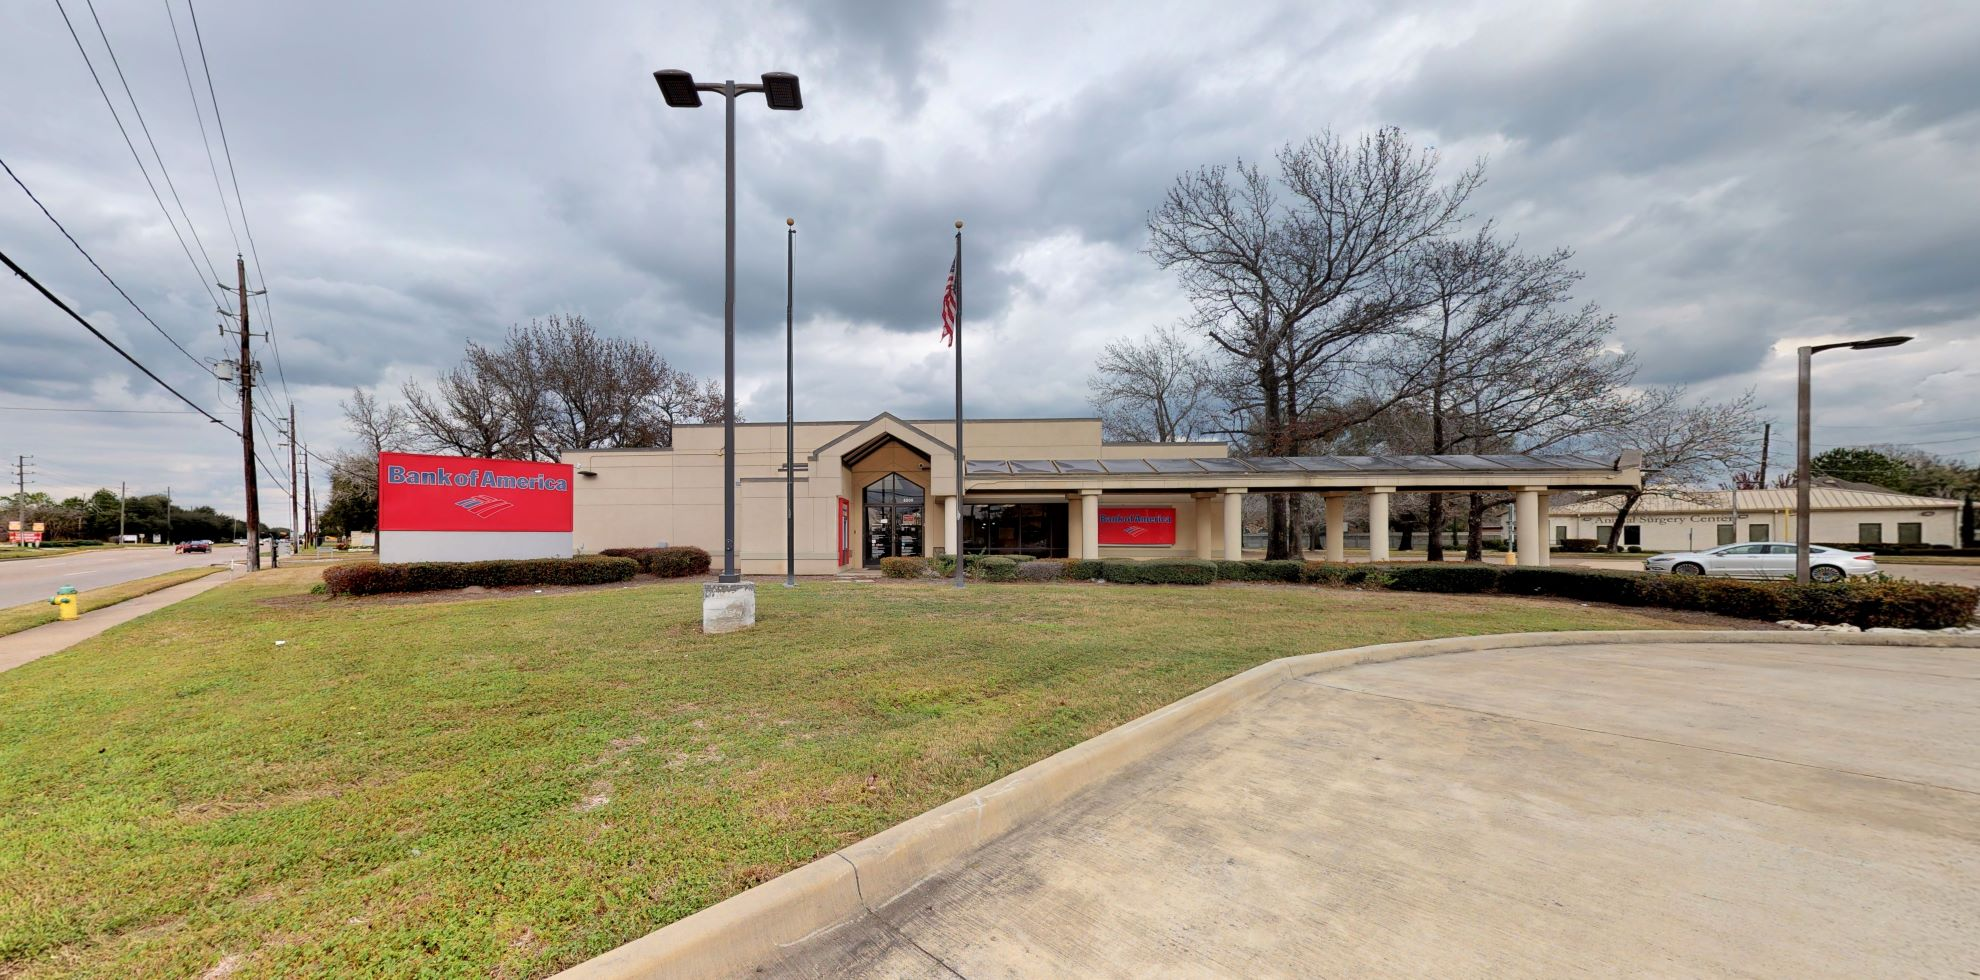 Bank of America financial center with drive-thru ATM | 8200 Jones Rd, Houston, TX 77065